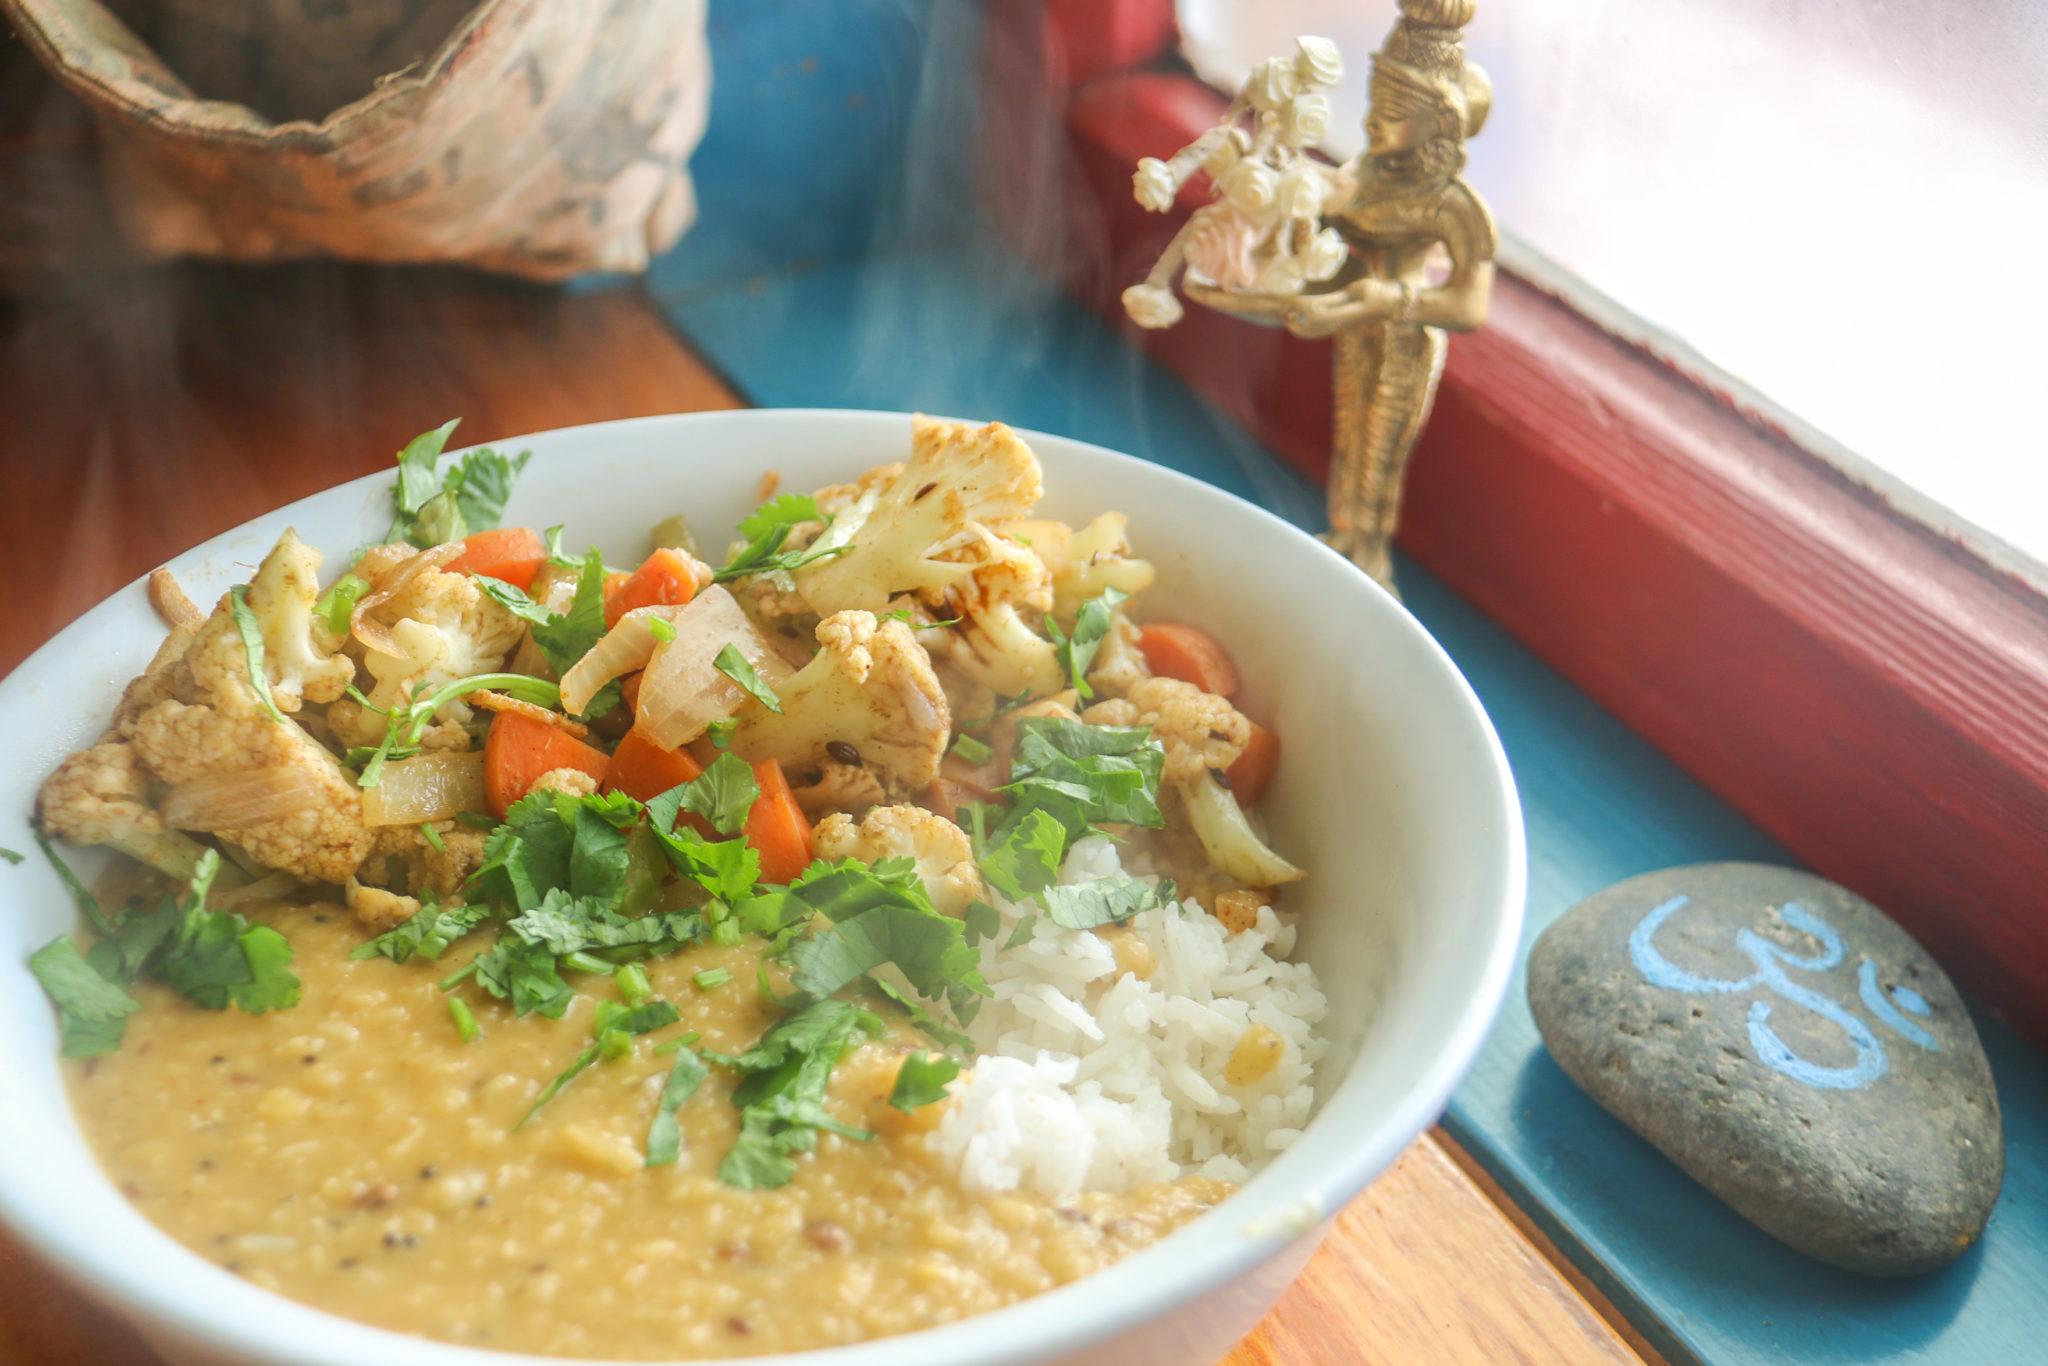 Anahata's Dahl Recipe